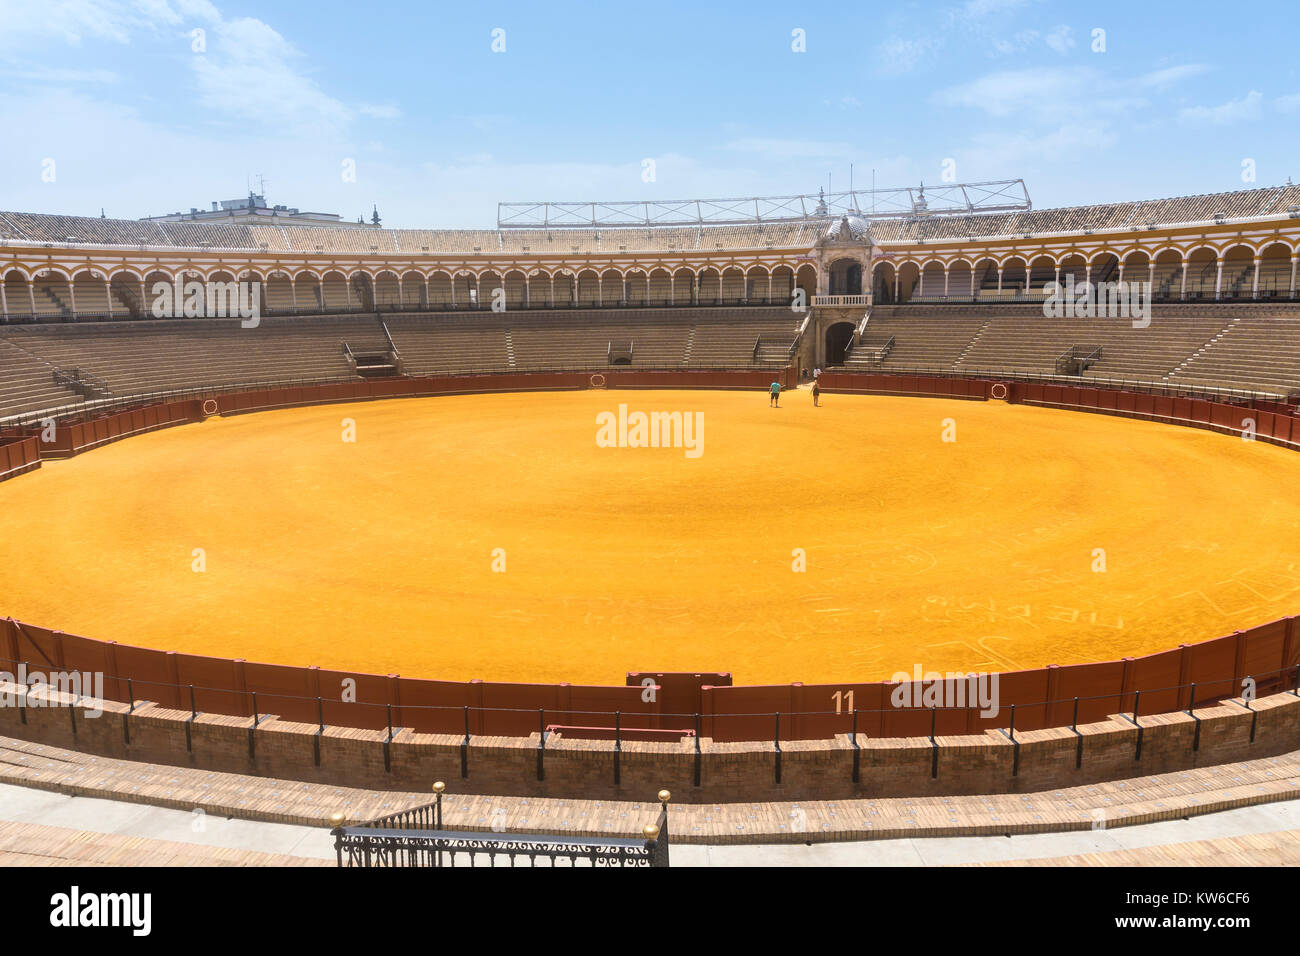 Seville,Spain-august 7,2017view of the inside of the Plaza de toros de la Real Maestranza de Caballería de - Stock Image